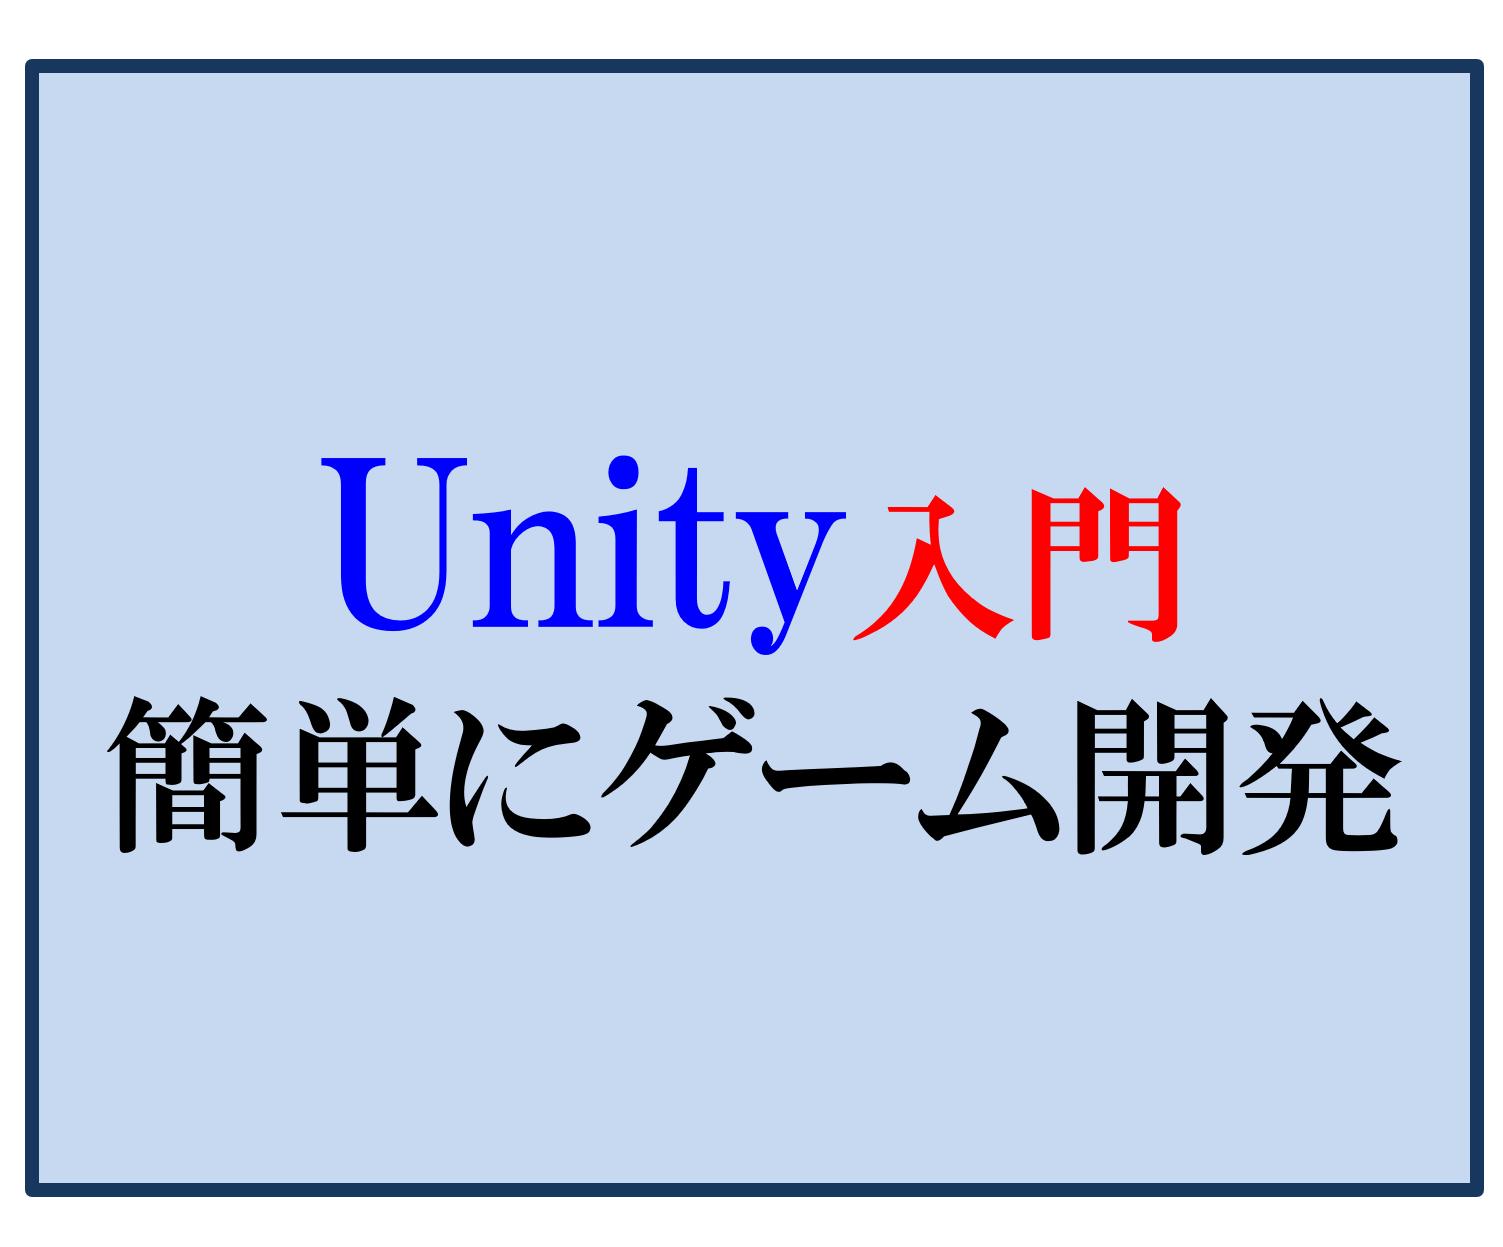 【Unity入門】ゲーム&アプリ開発をする流れ|これで簡単にできてしまう!